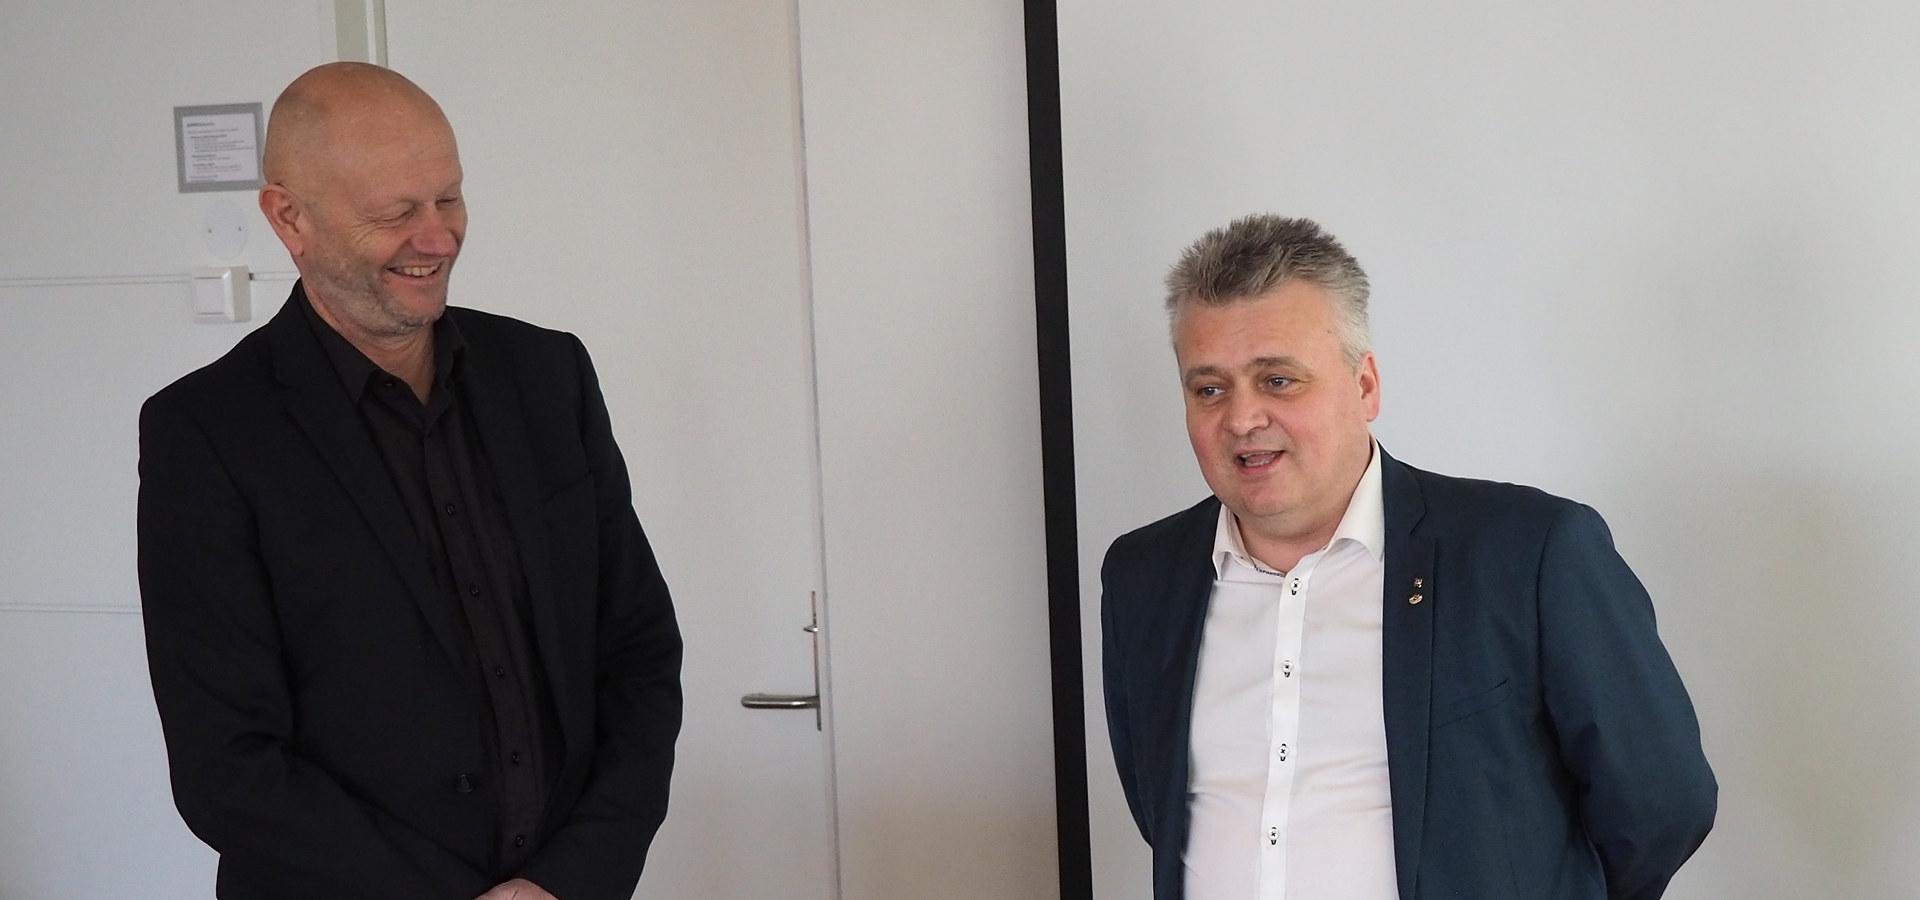 Møte mellom Stein Lier-Hansen, Jørn Eggum og riksmekler Mats Ruland under Norsk Industris representantskap 5. mars 2020. Foto: Norsk Industri